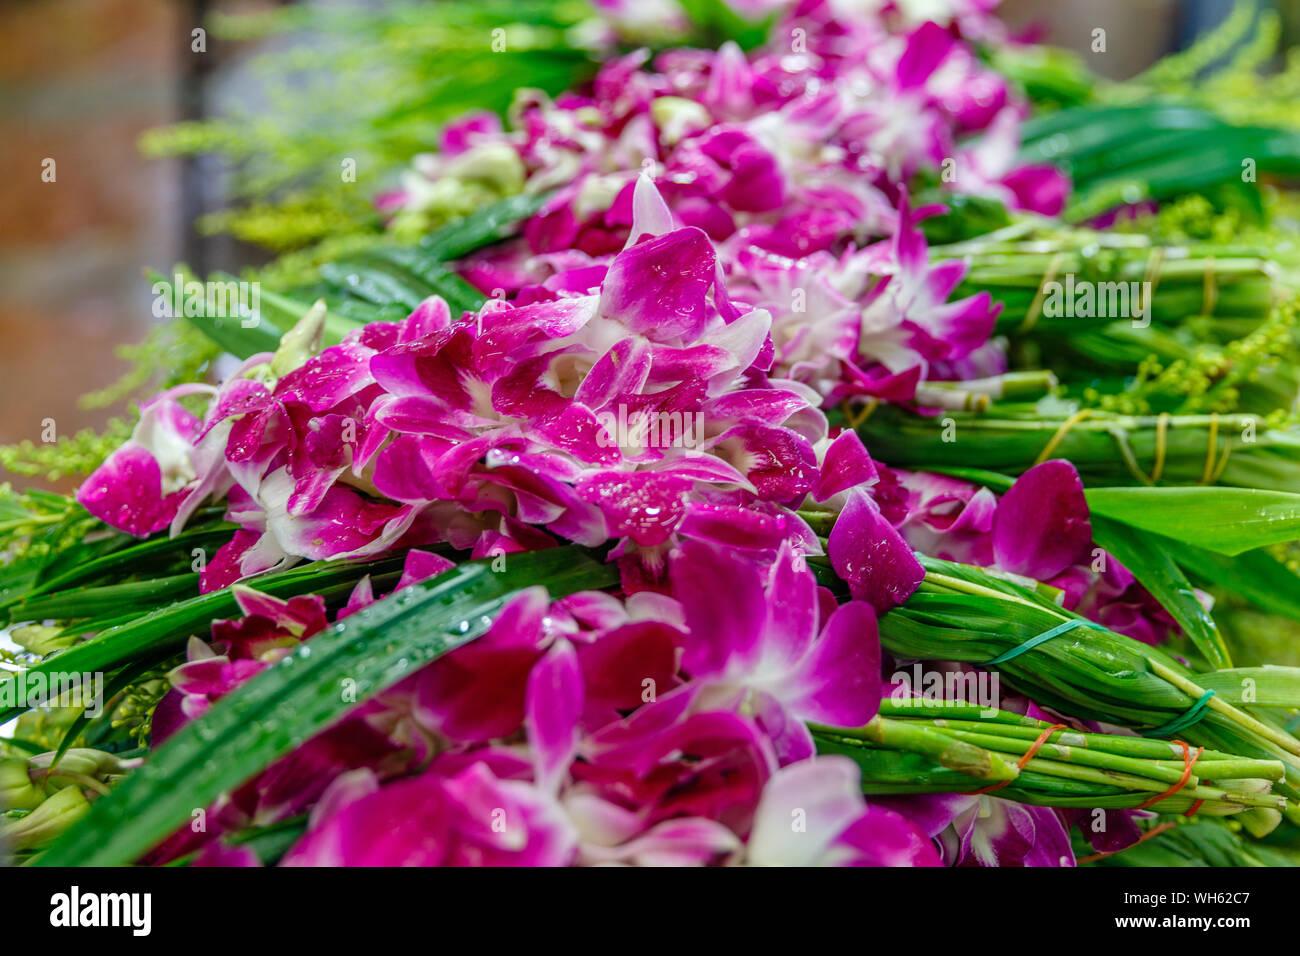 Fresh pink orchids at Pak Khlong Talat, Bangkok flower market. Thailand. Stock Photo